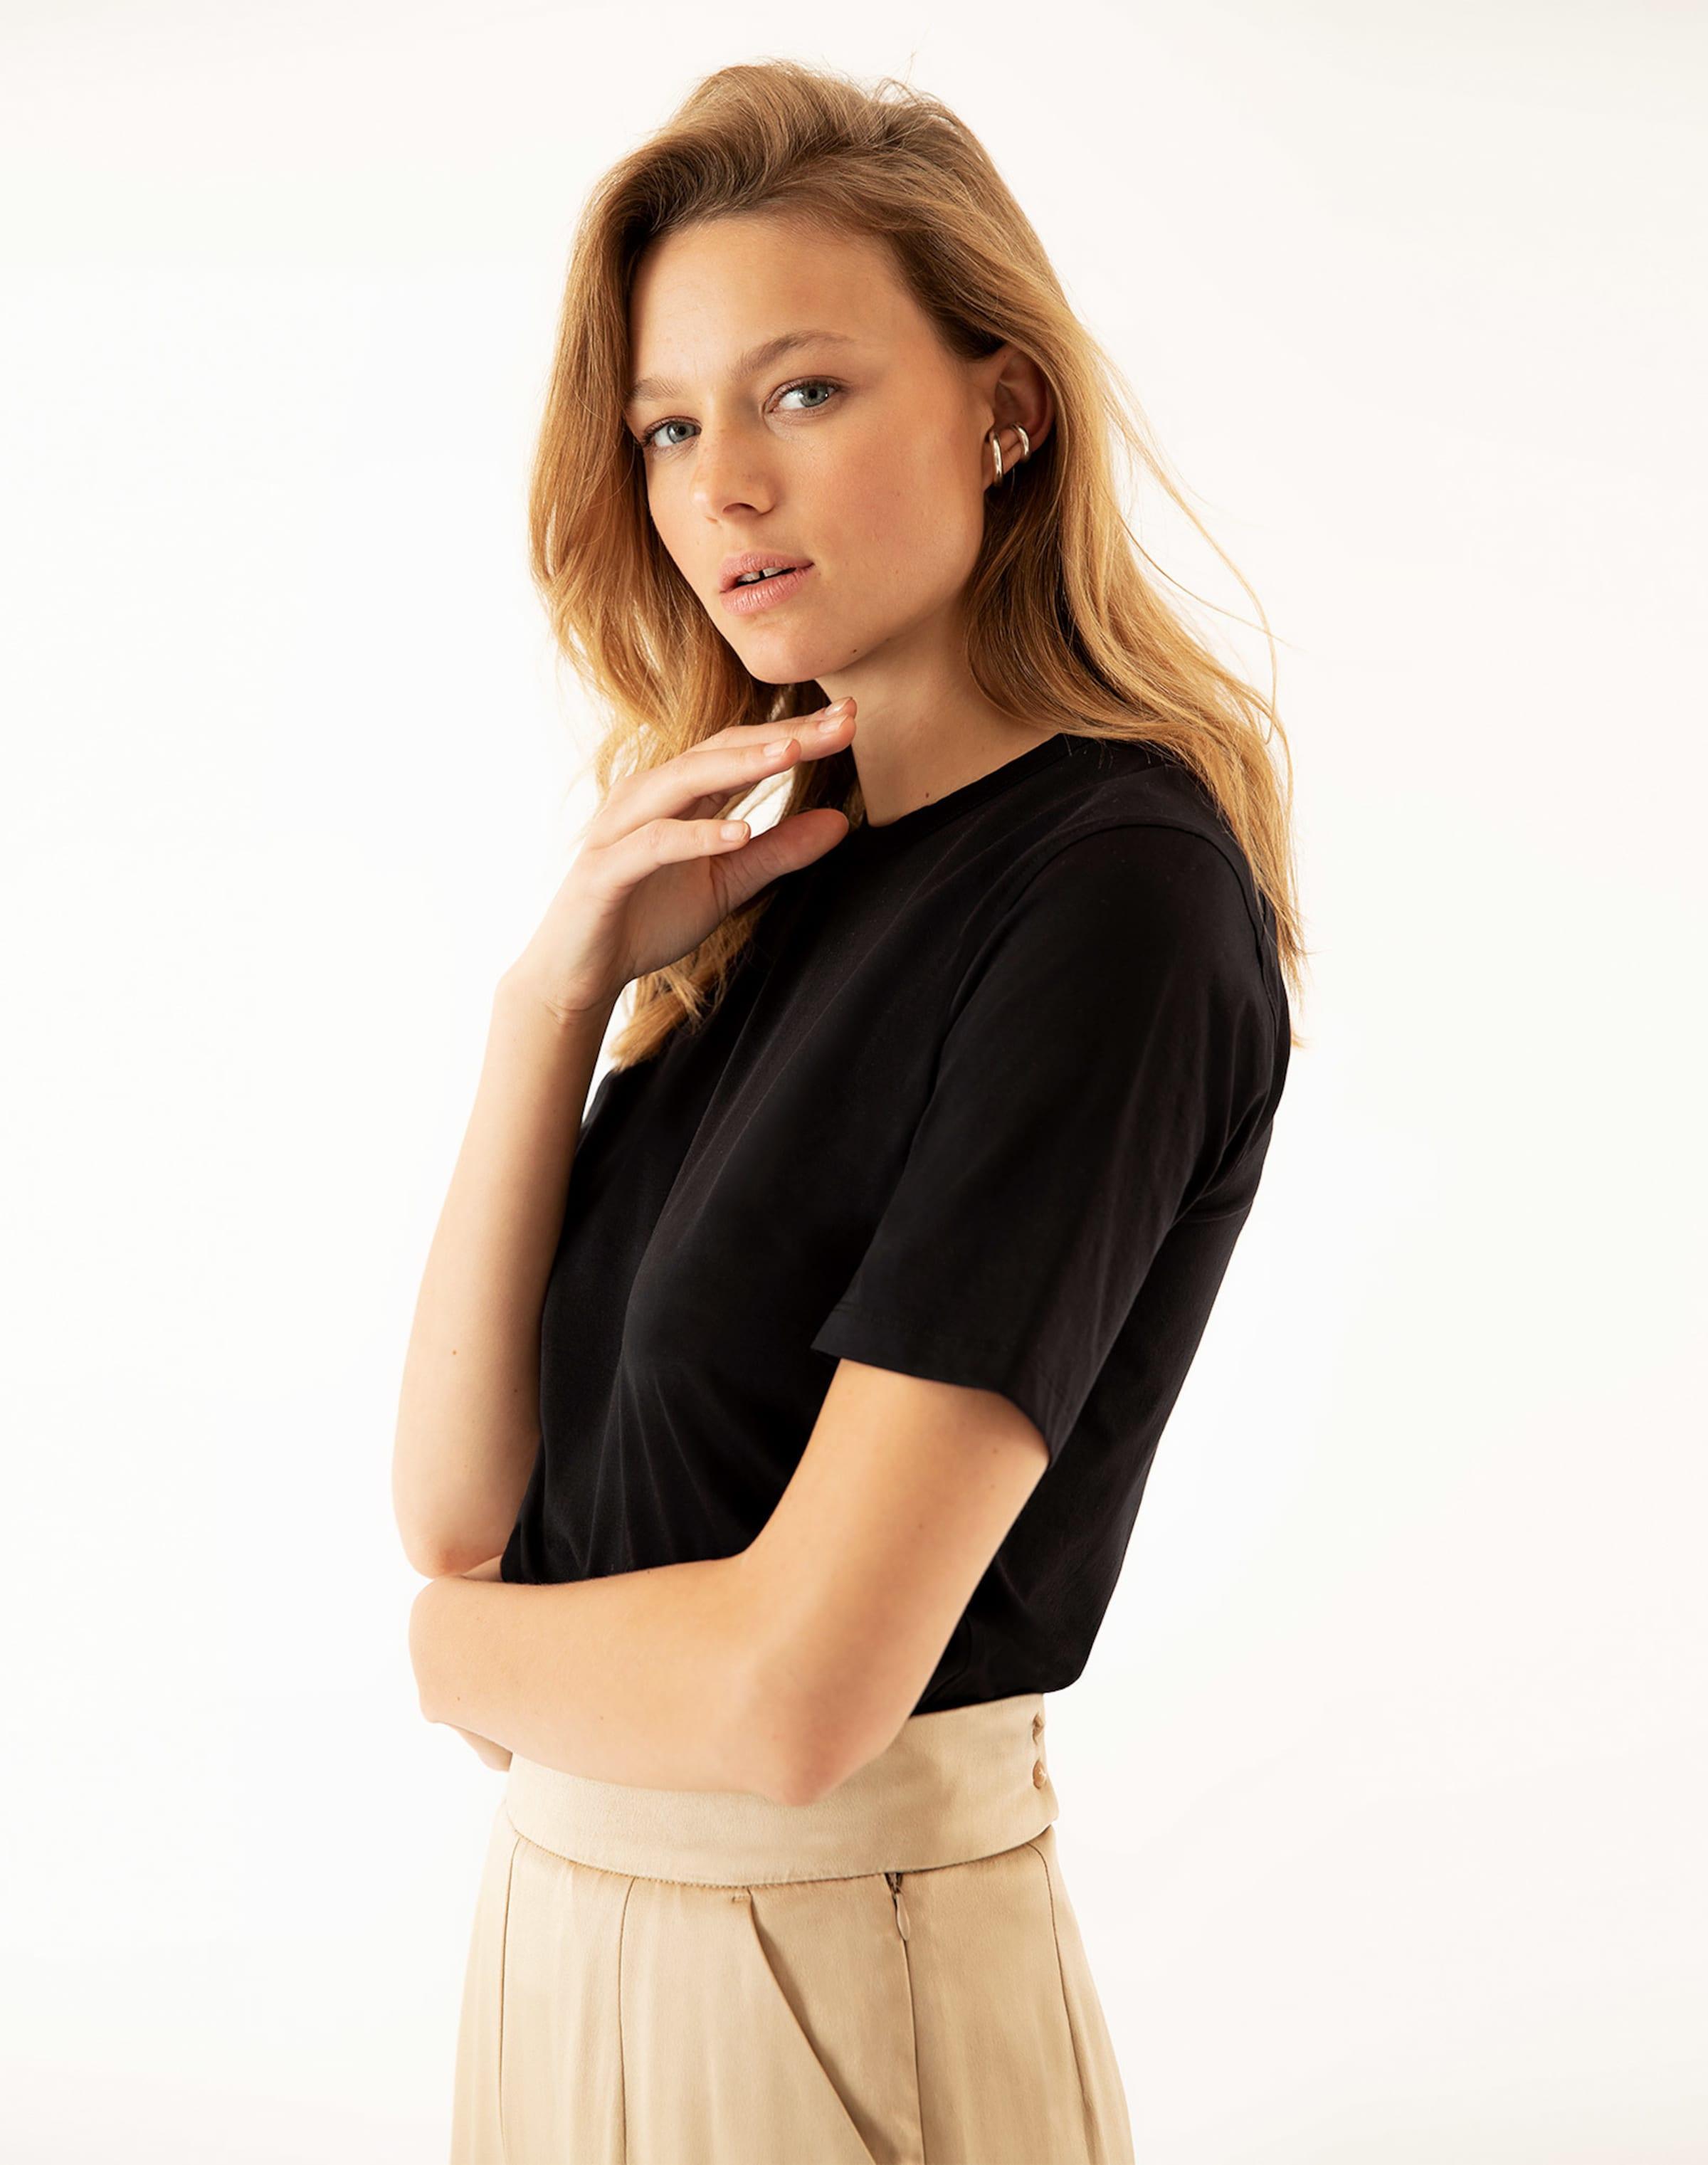 Ivyamp; Schwarz Oak shirt In T 1uKlc3TFJ